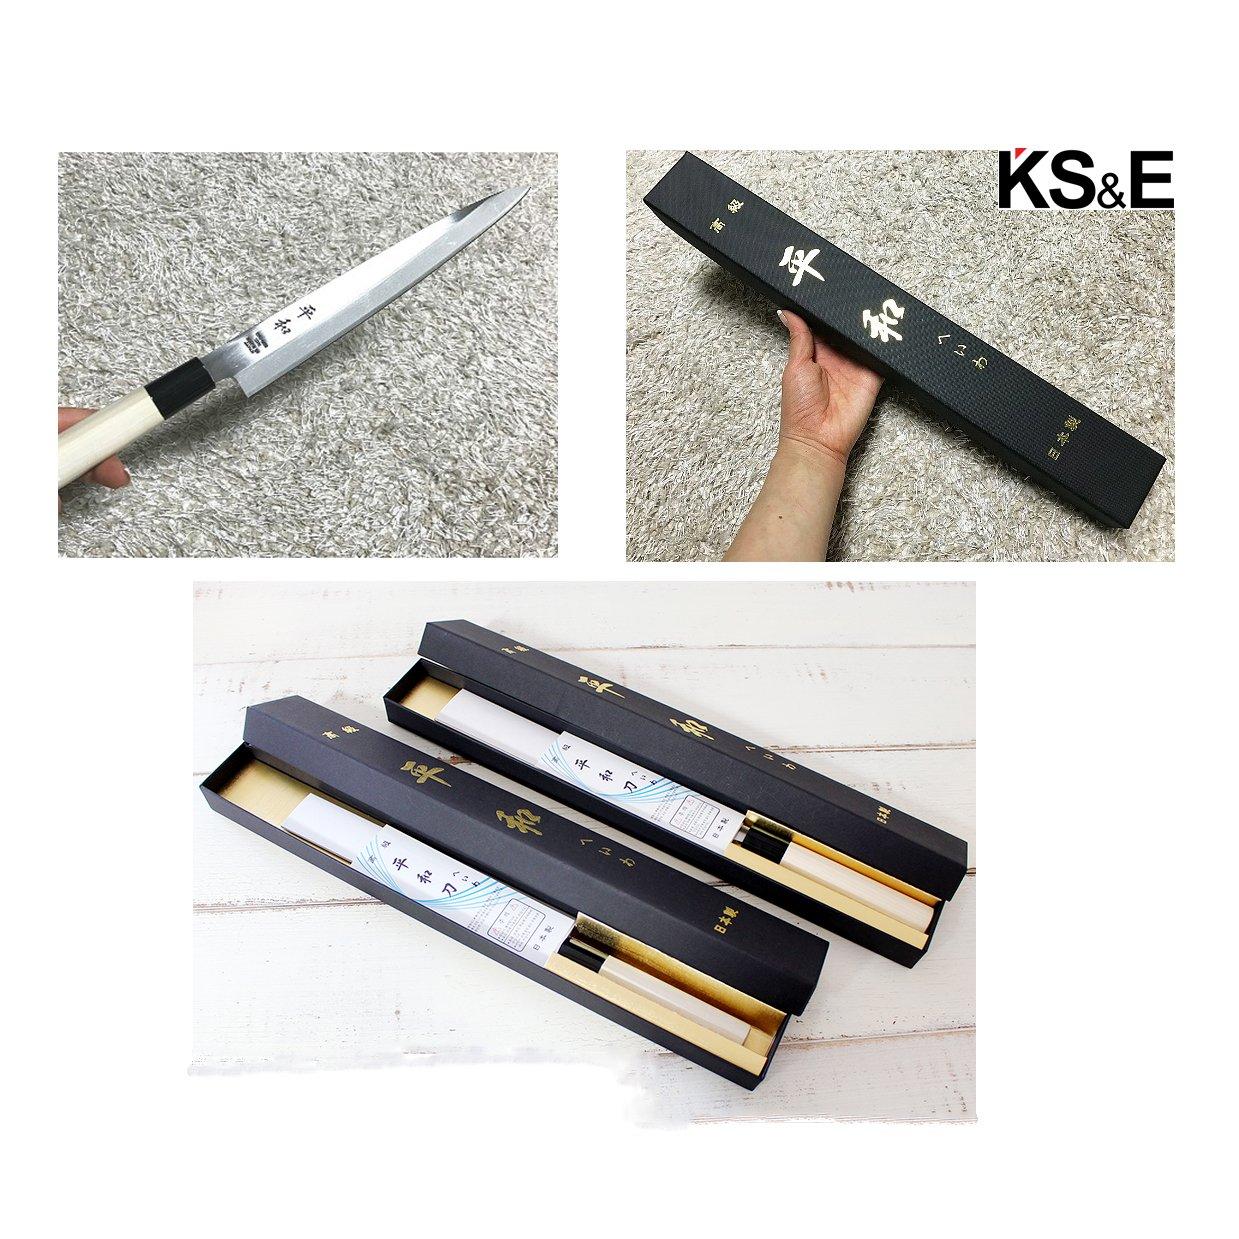 KS&E Hasegawa Stainless Steel Right Handed Japanese Knife, Filet Knife Fish, Asian, Yanagi Sushi Sashimi Knife (8.5-inch(210mm) Right Handed Yanagi) by Peace (Image #6)